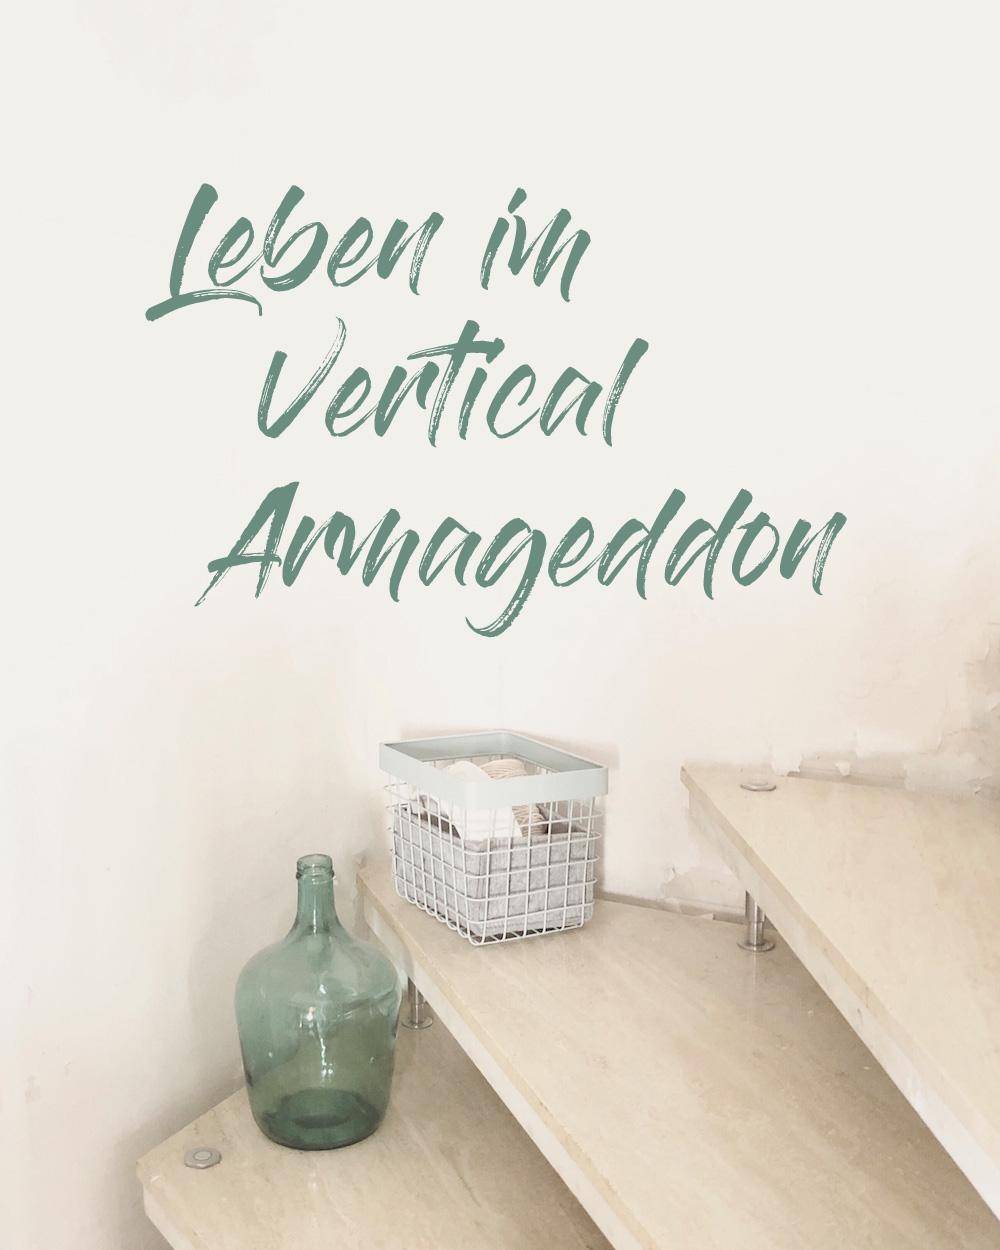 Leben im Vertical Armageddon